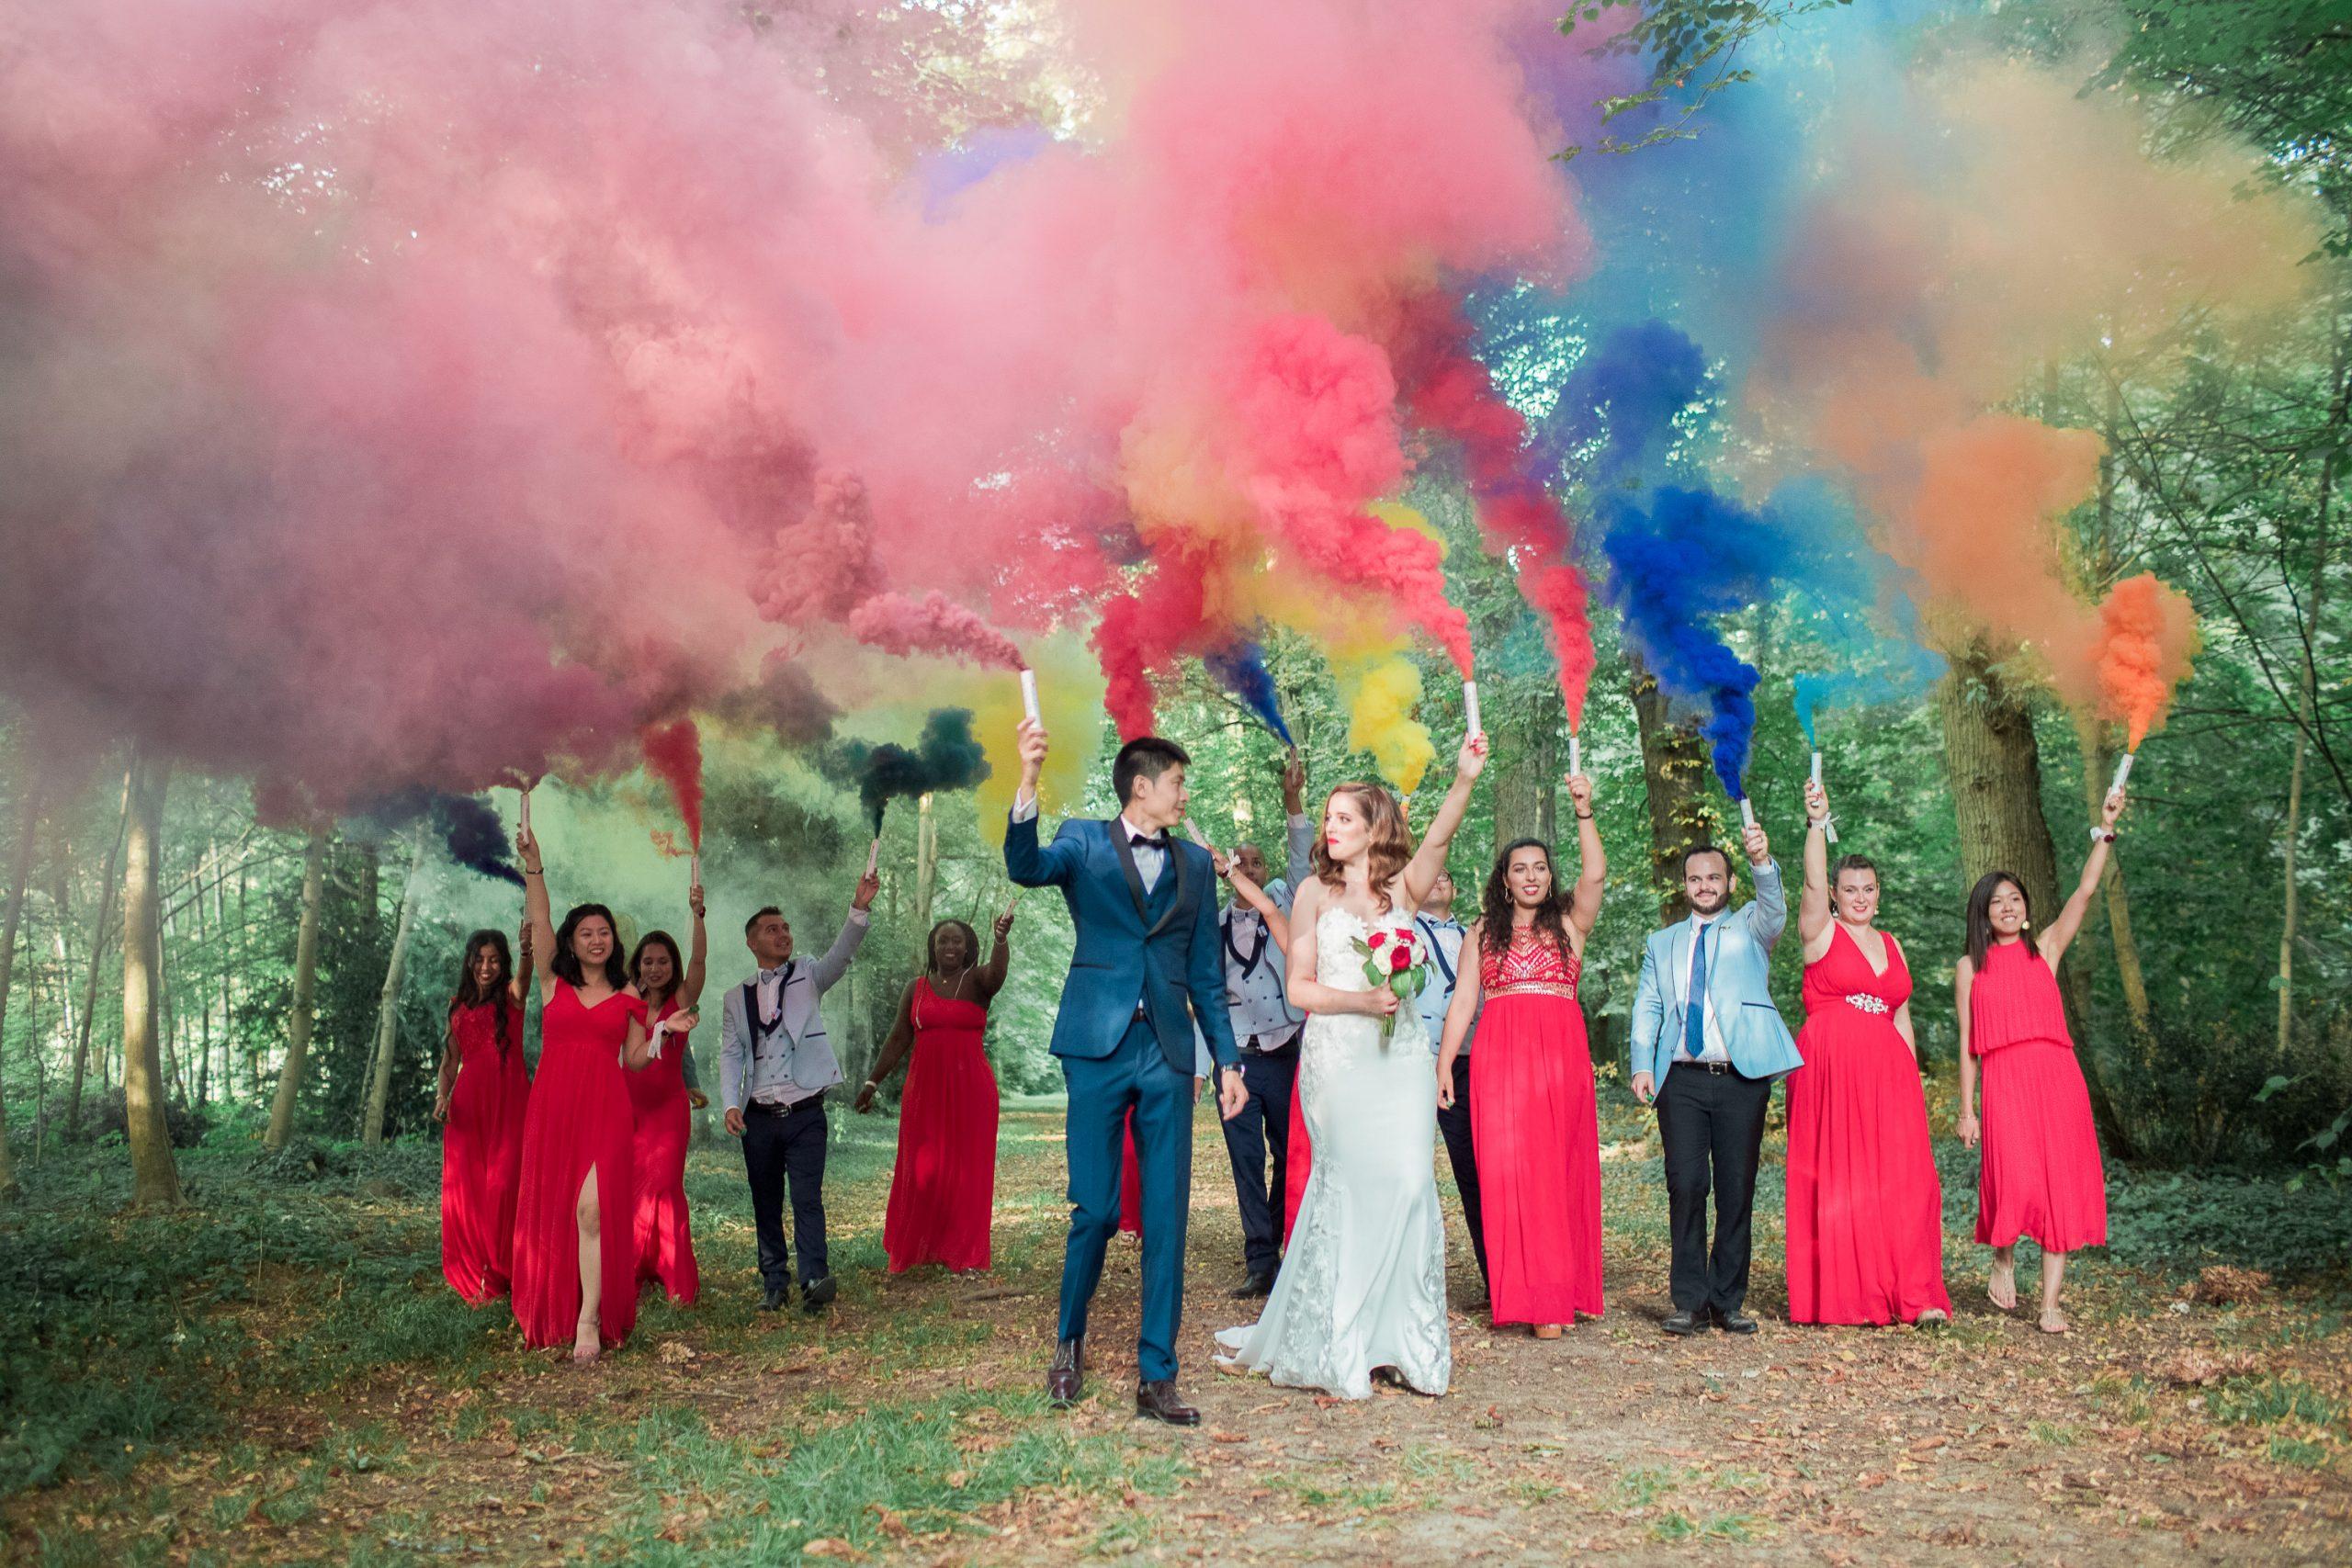 photographe-mariage-chateau-nandy-exterieur-fumigéne